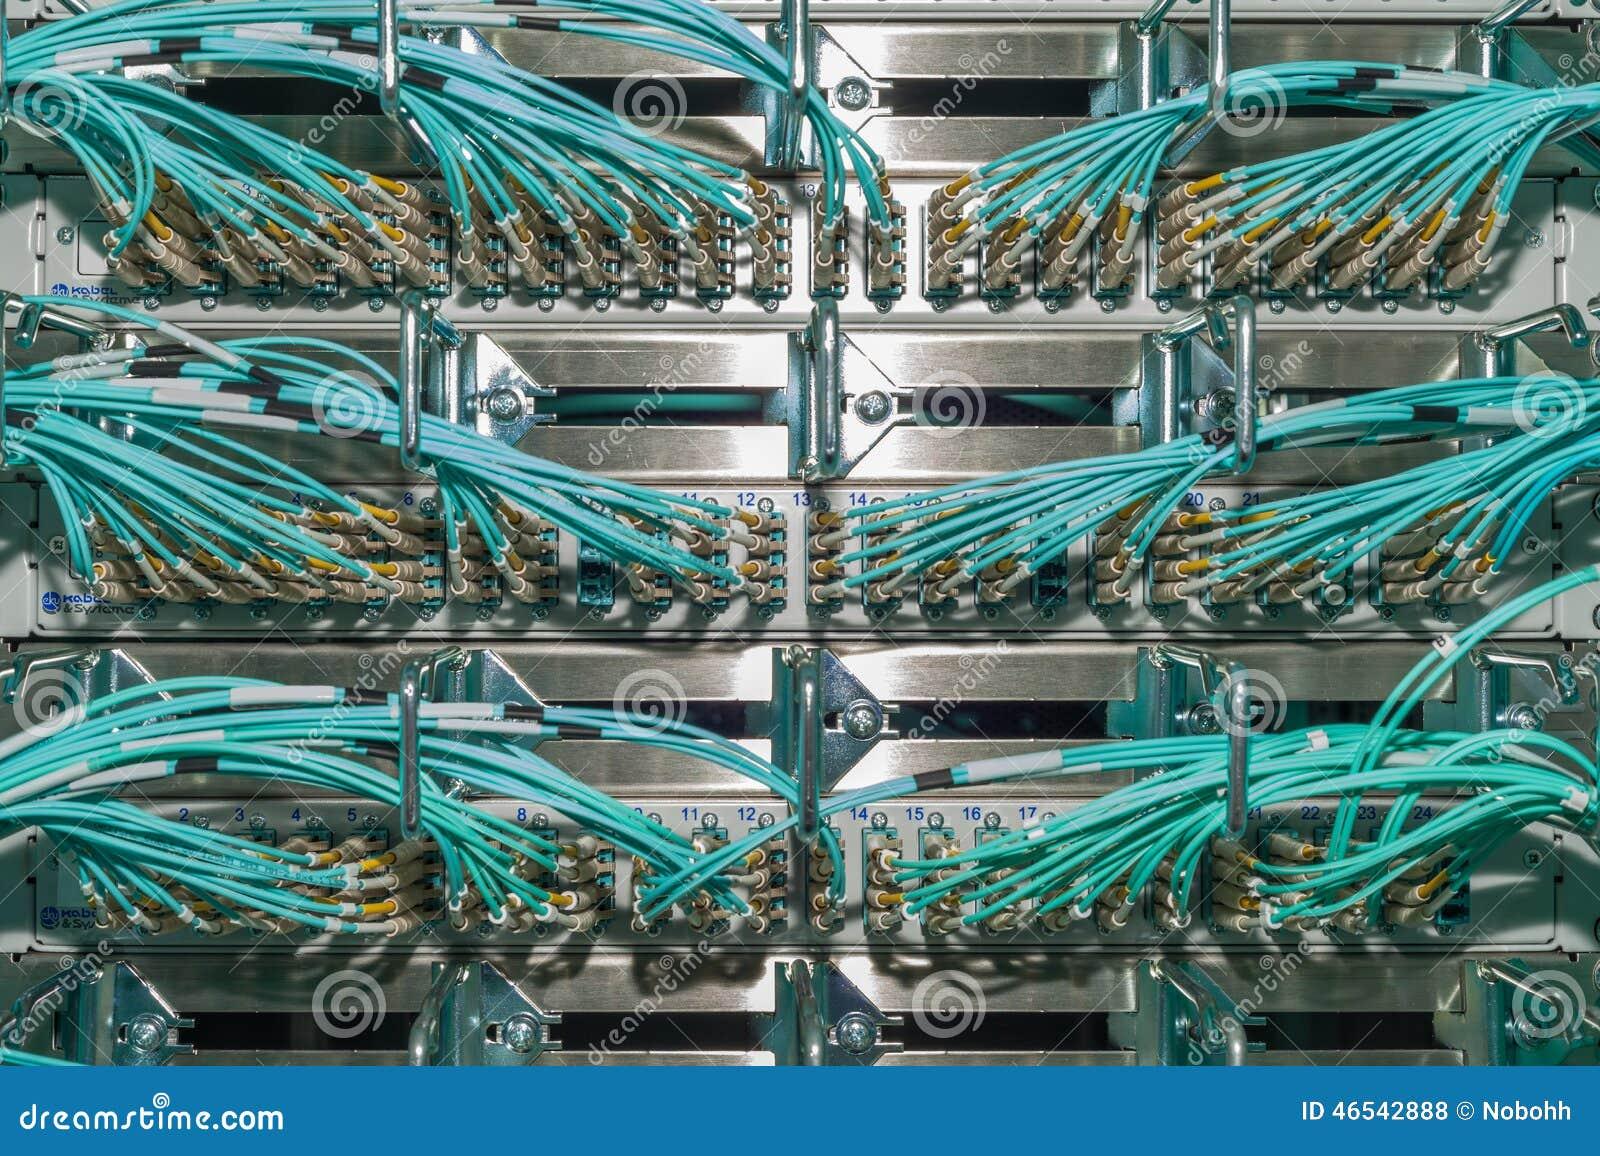 Optical Patch panel in a data center für Cloud Services